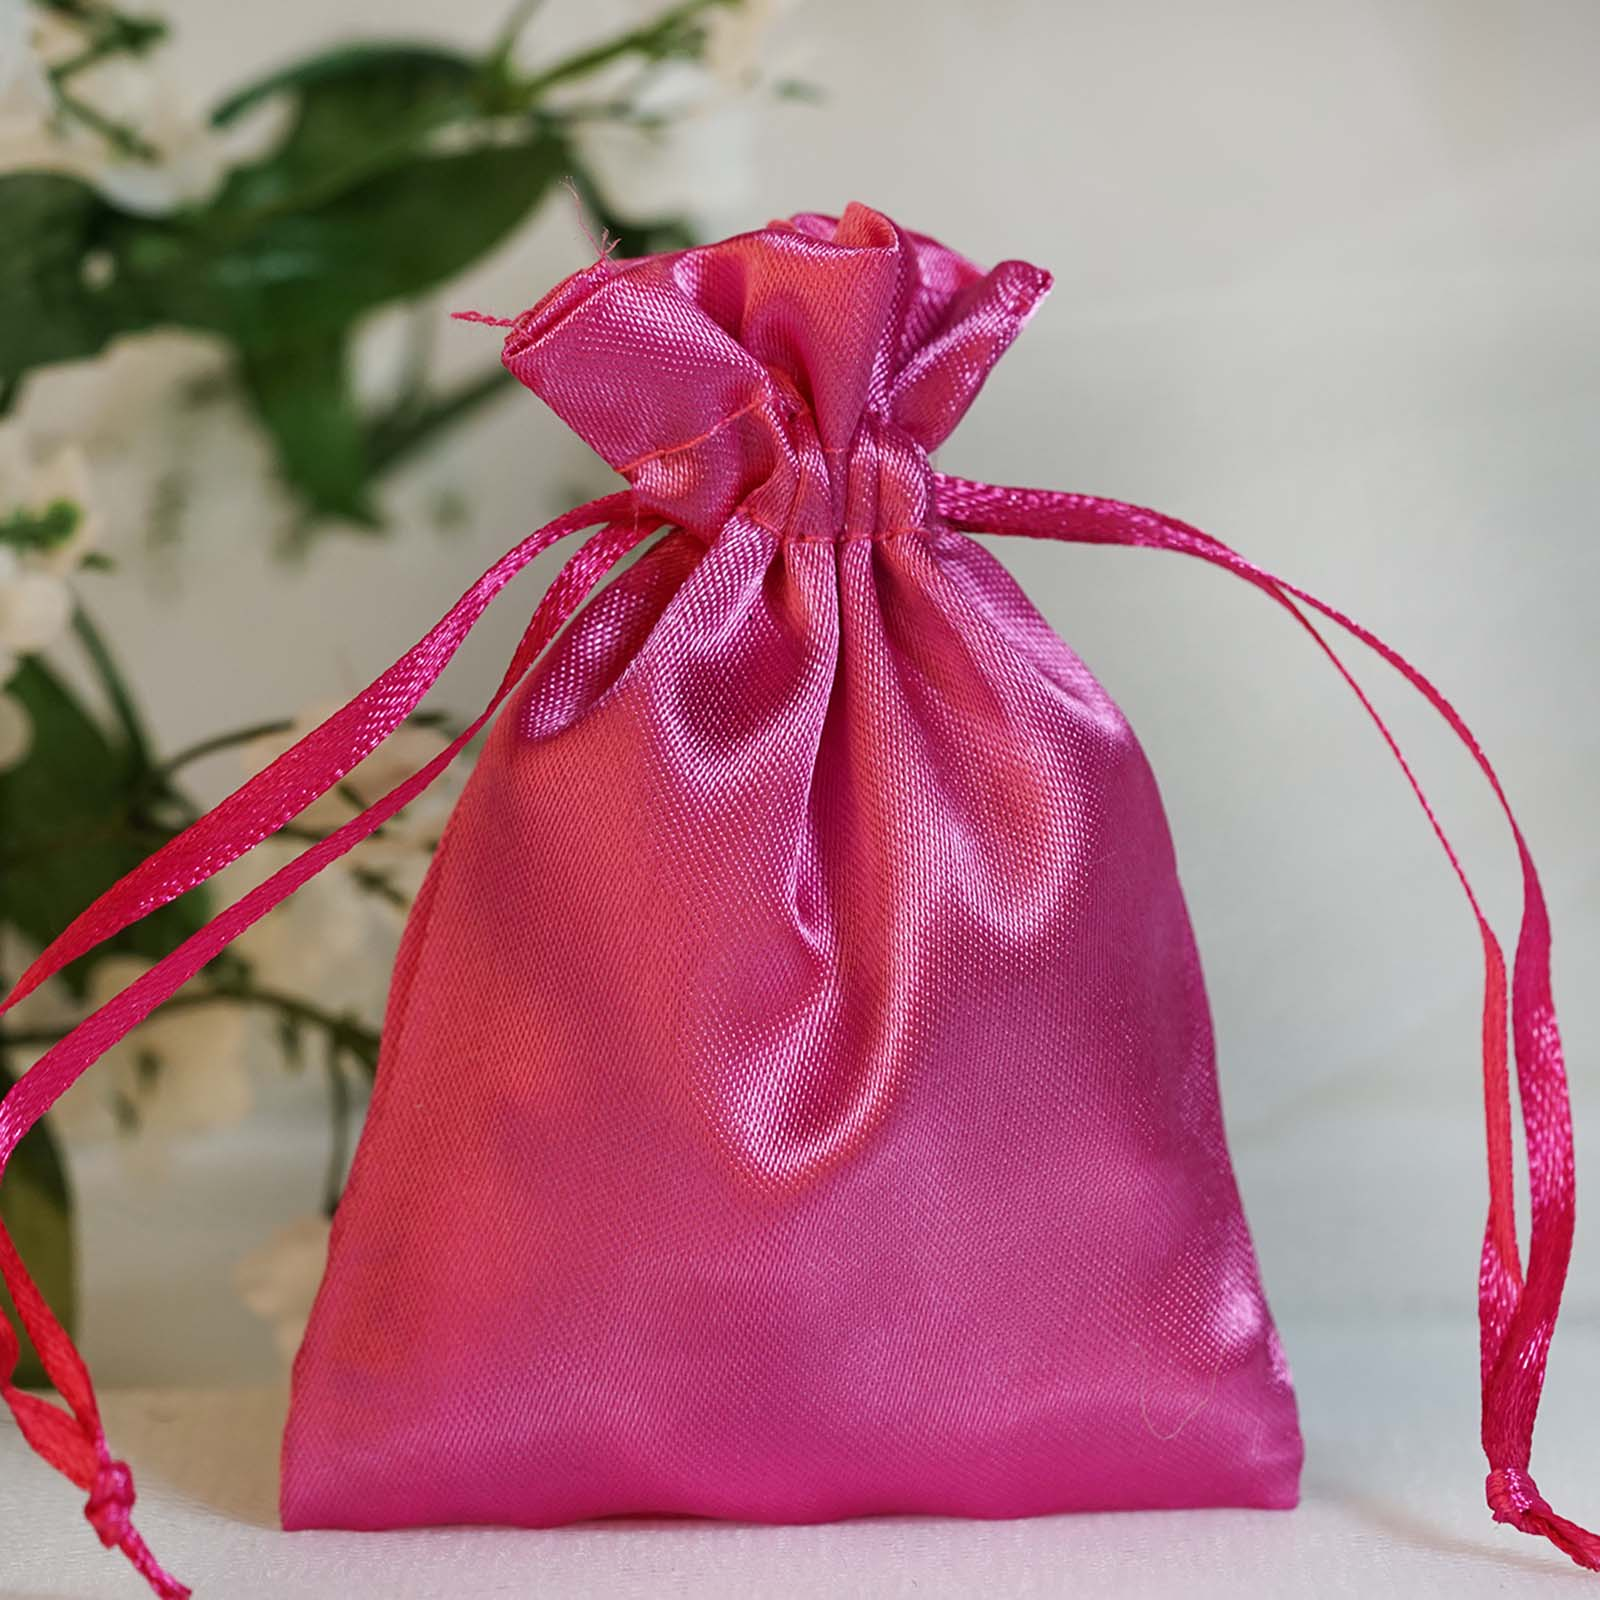 Wedding Gift Pouches: 60 Pcs 3x3.5 Inch SATIN Drawstring FAVOR BAGS